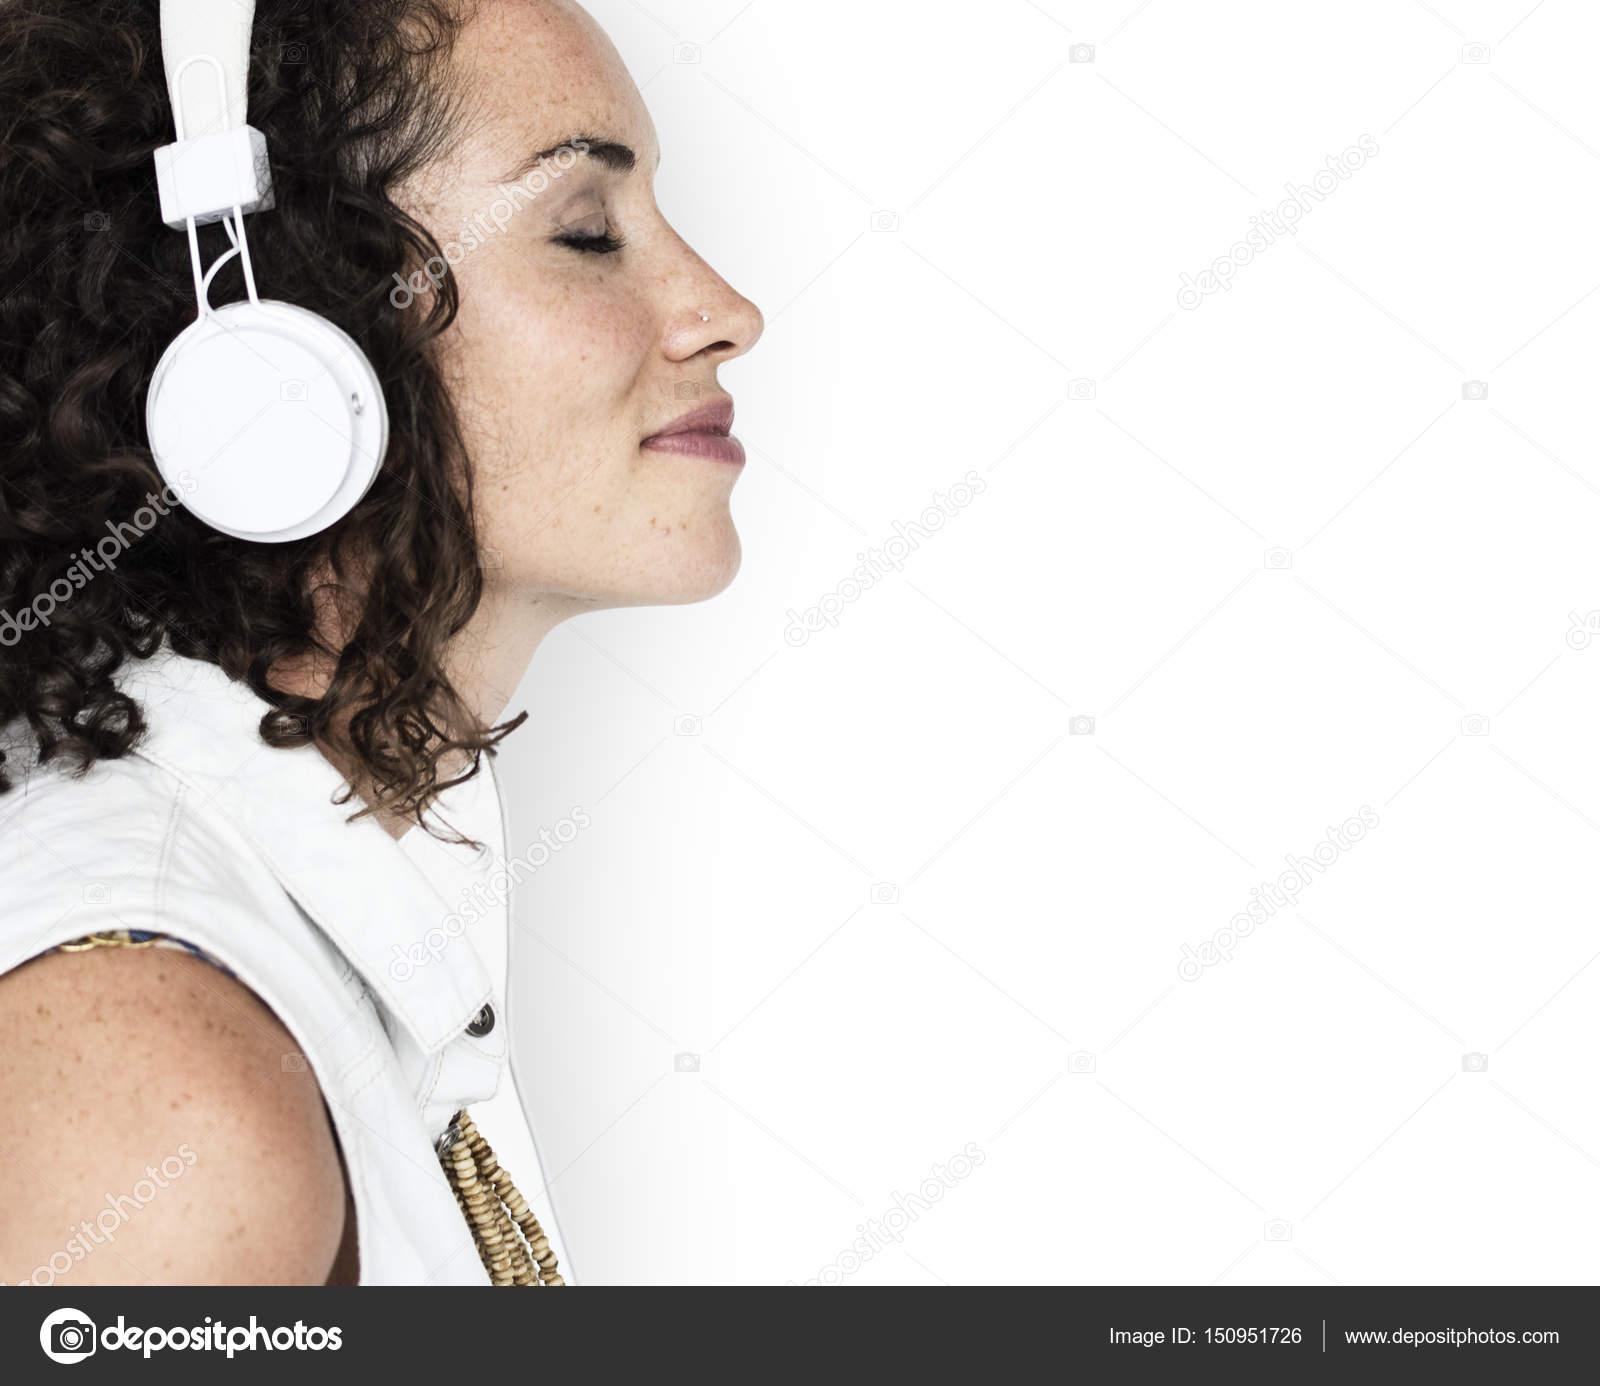 princess leia hair headphones